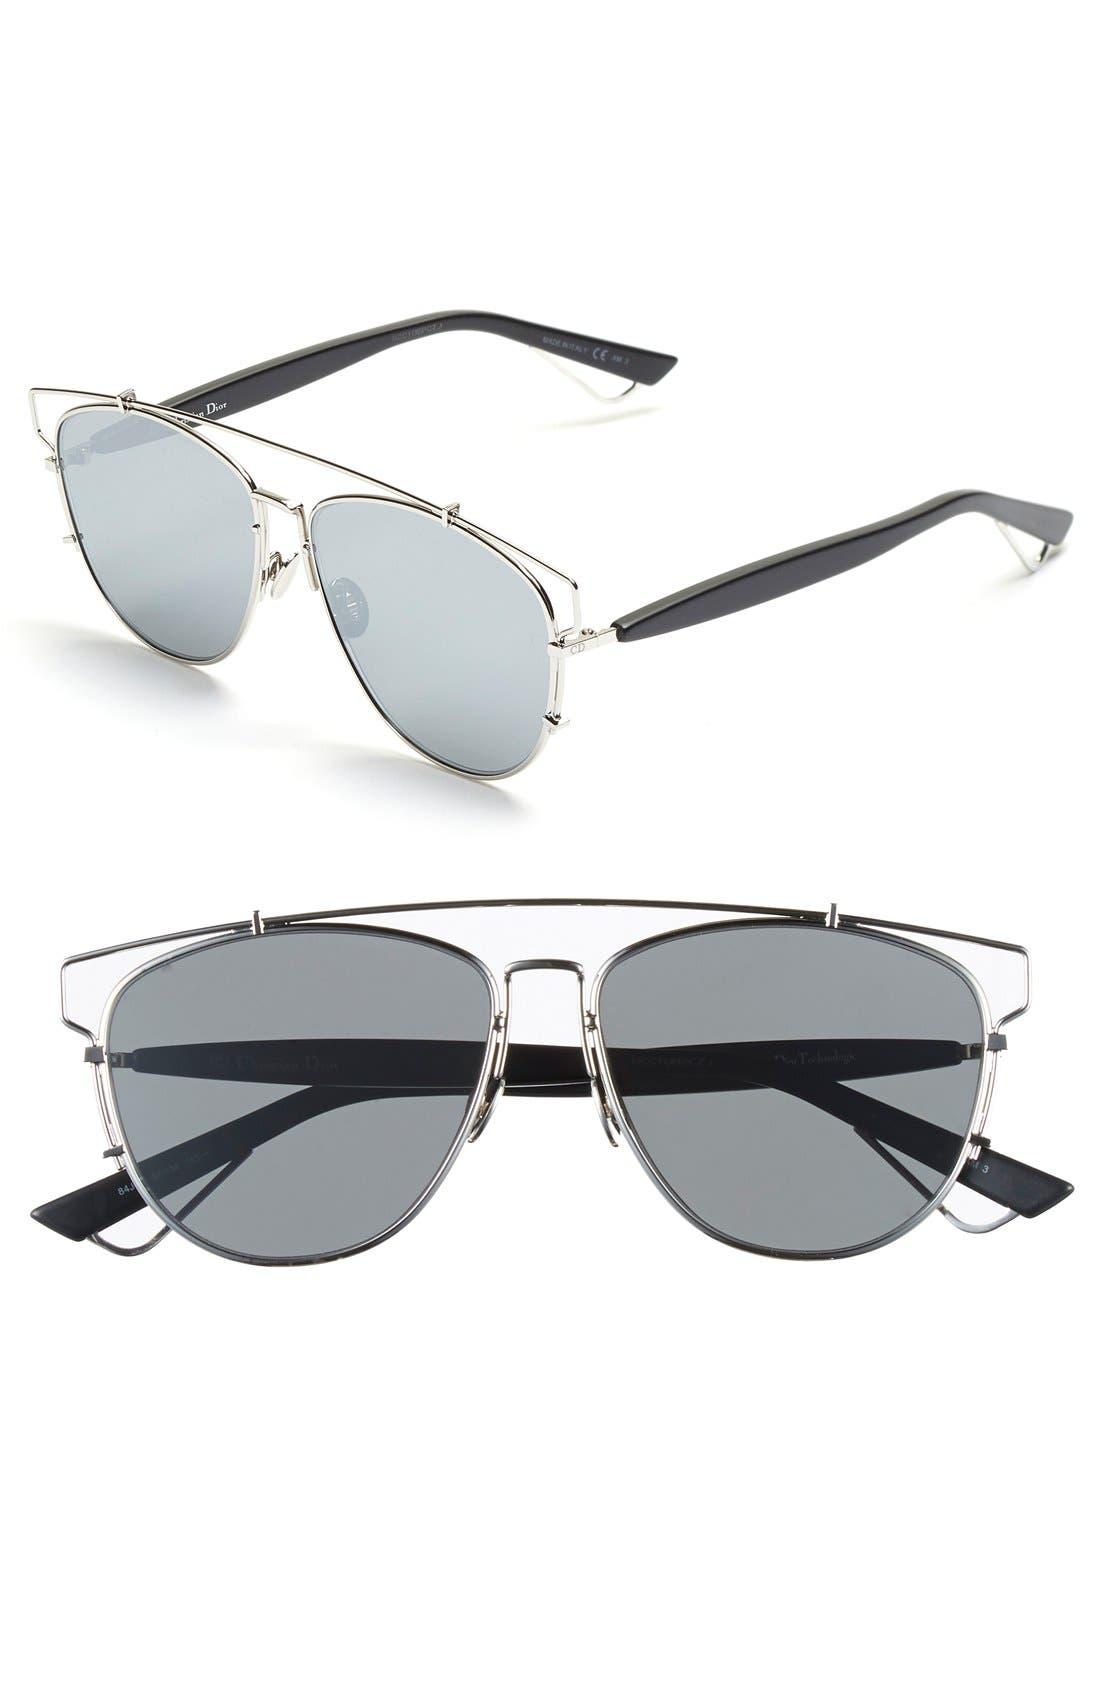 Technologic 57mm Brow Bar Sunglasses,                             Main thumbnail 5, color,